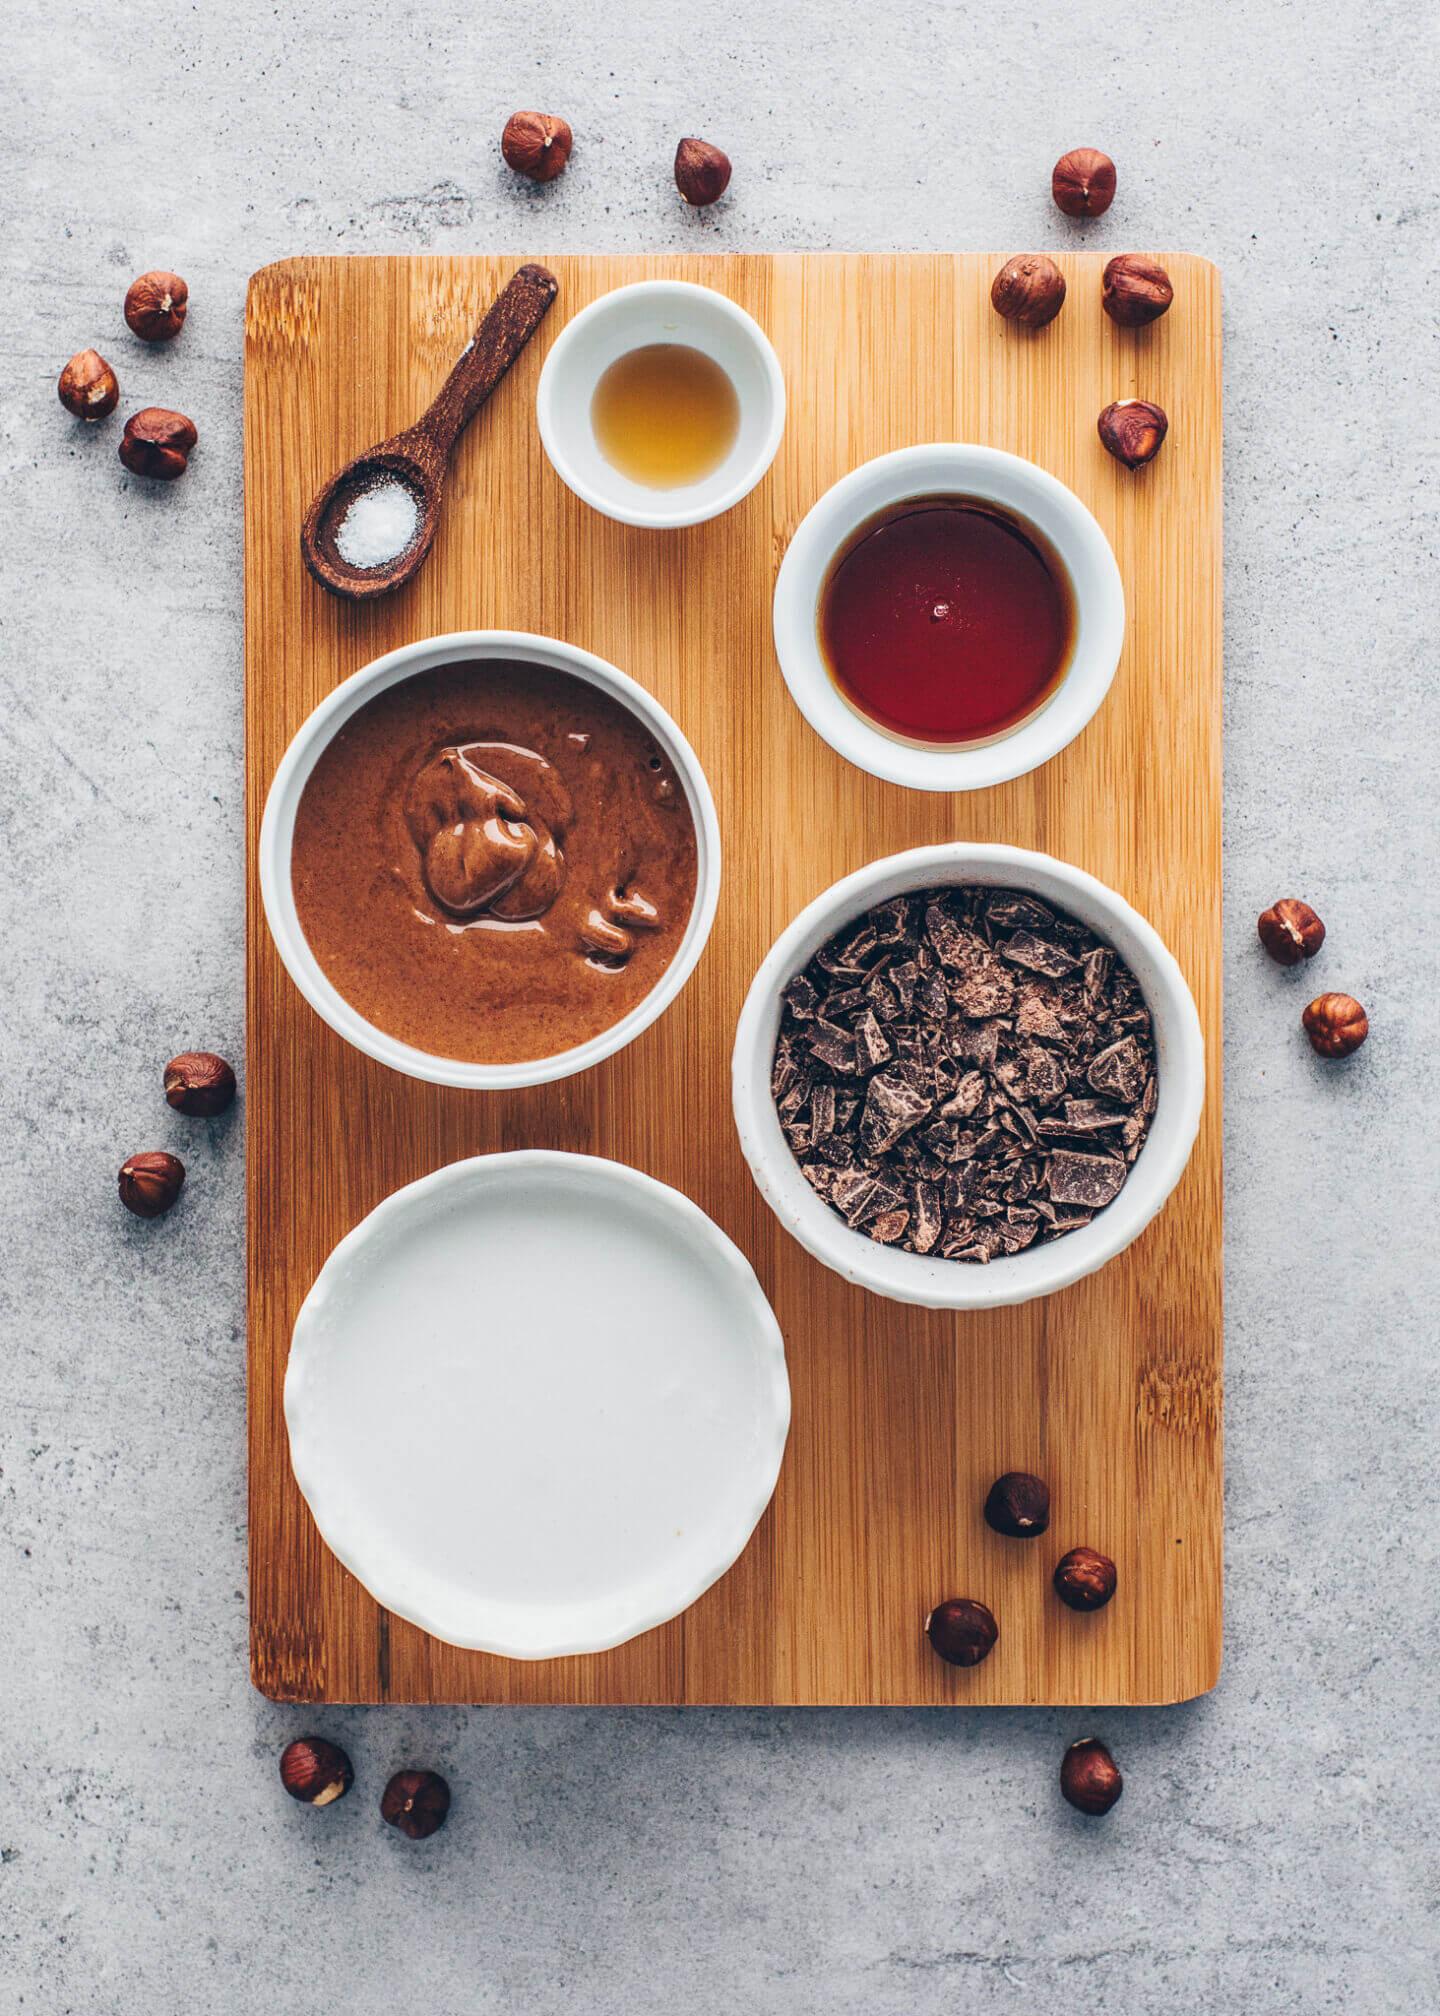 Ingredients for Vegan Ferrero Rocher - Chocolate Hazelnut Truffles